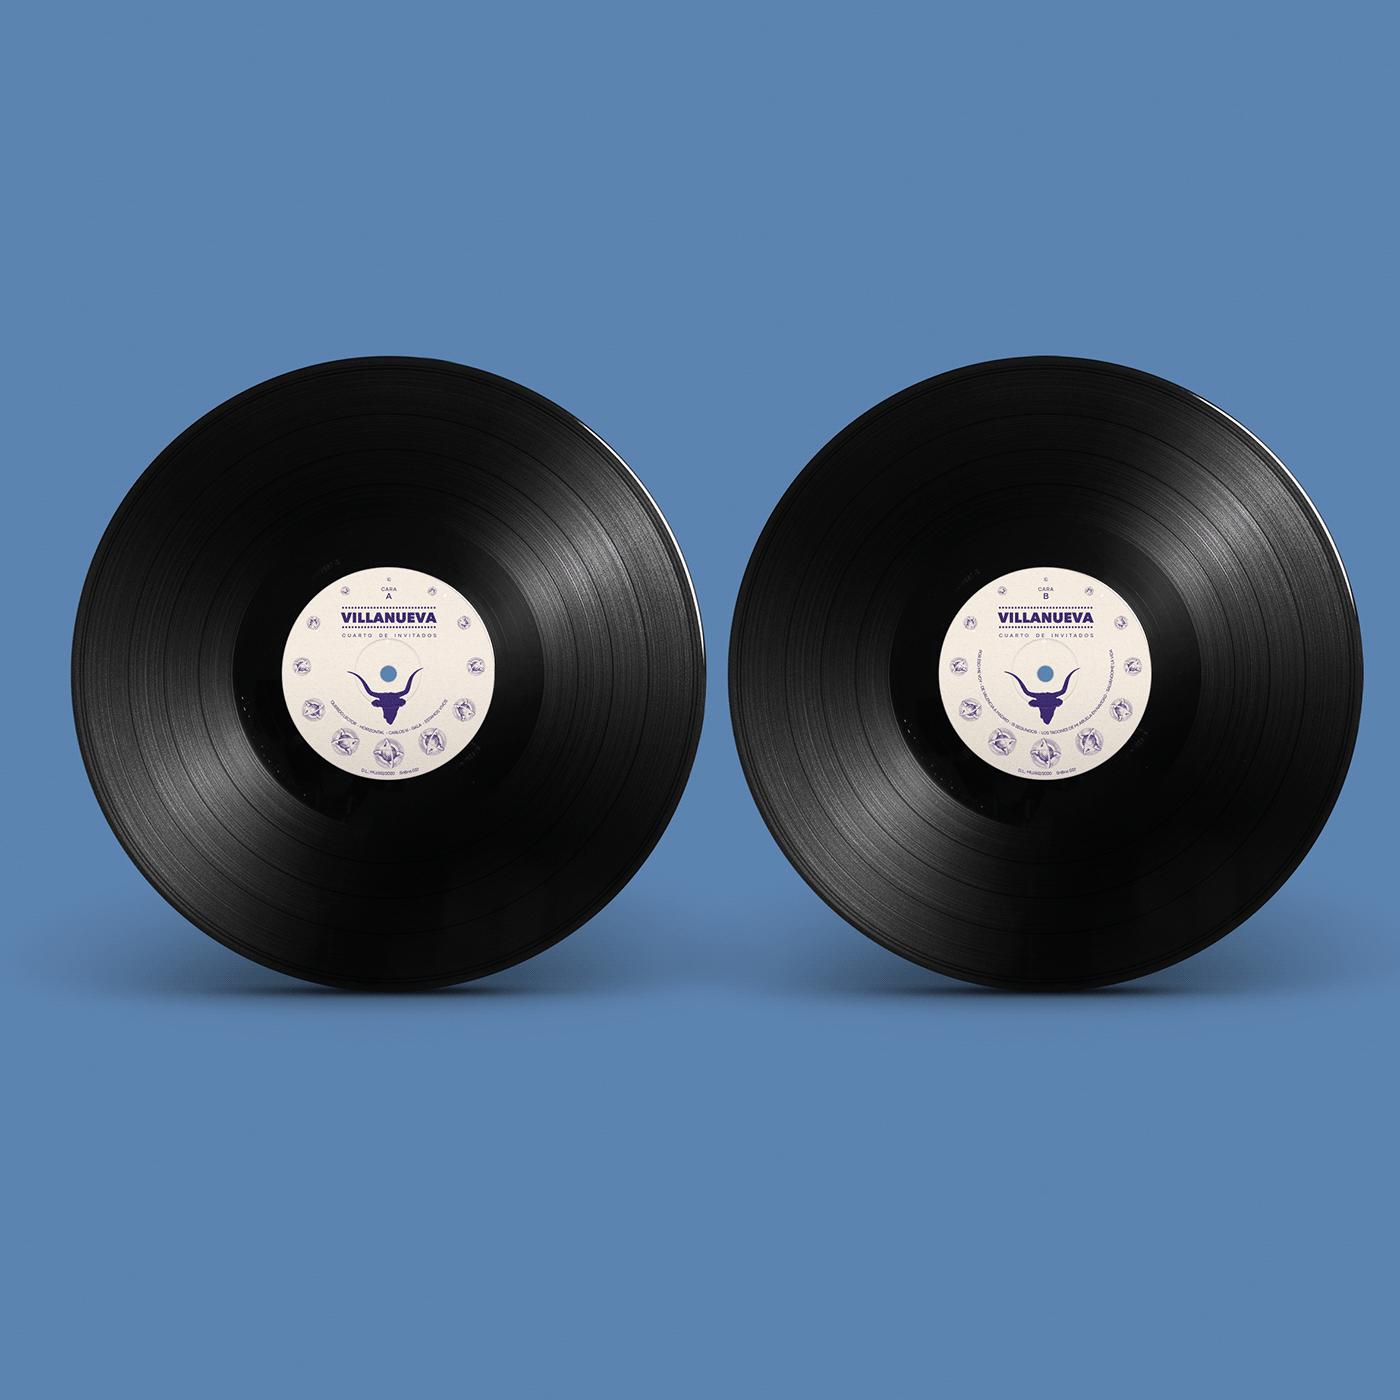 Image may contain: vinyl record